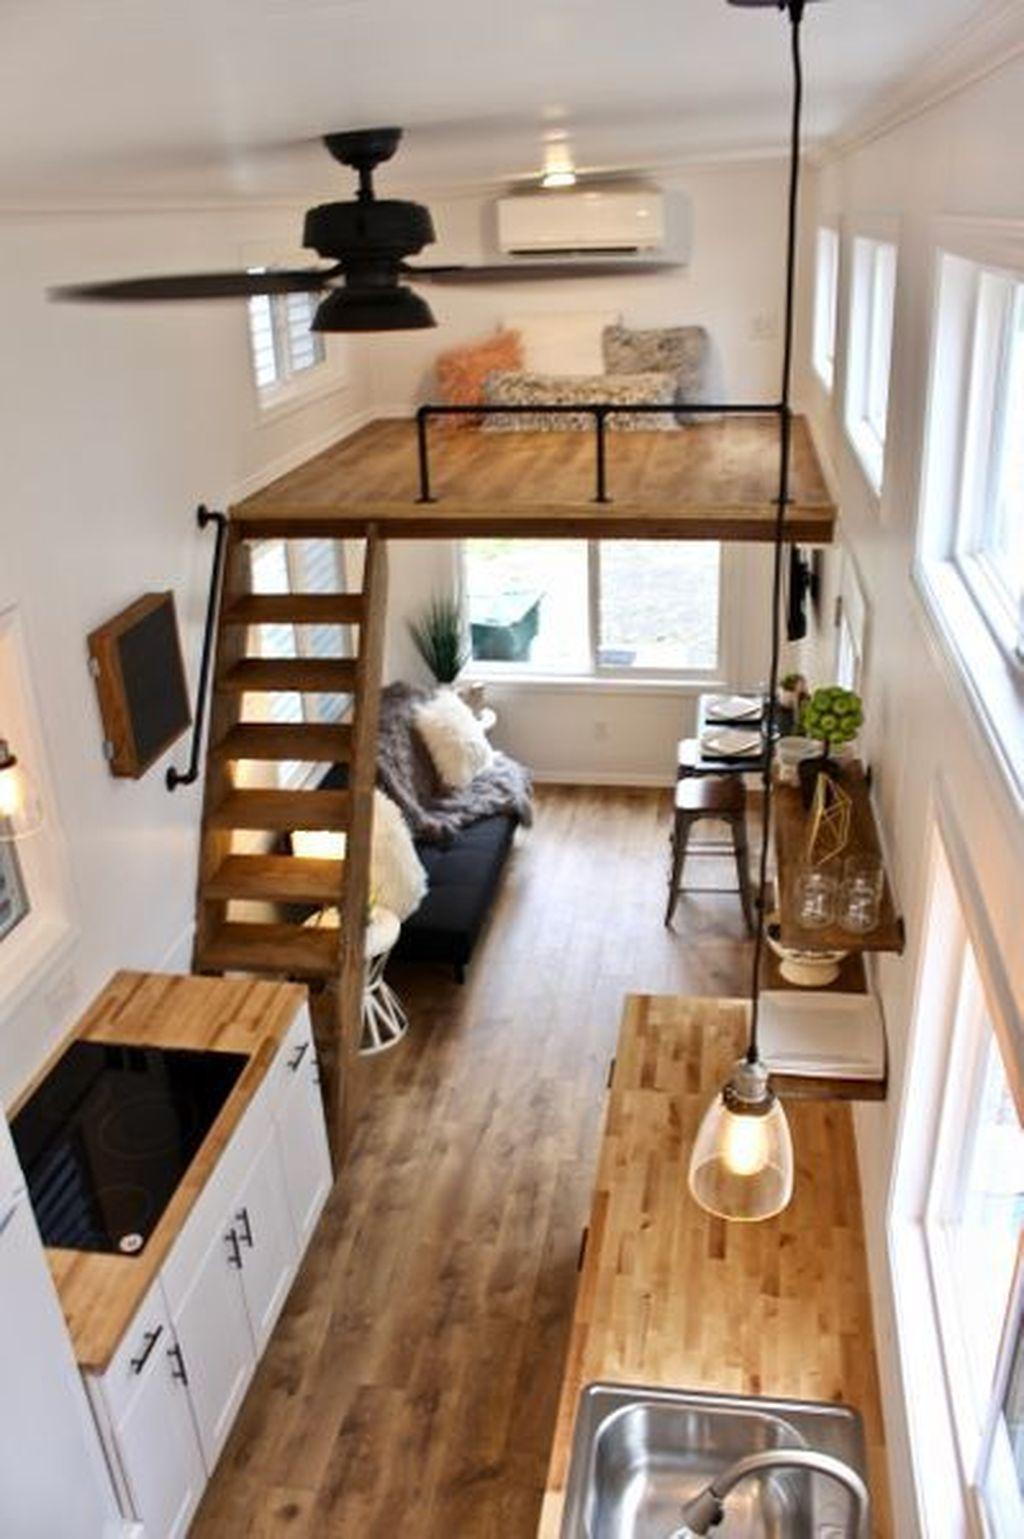 34 Fabulous Tiny House Design Ideas You Never Seen Before Tiny